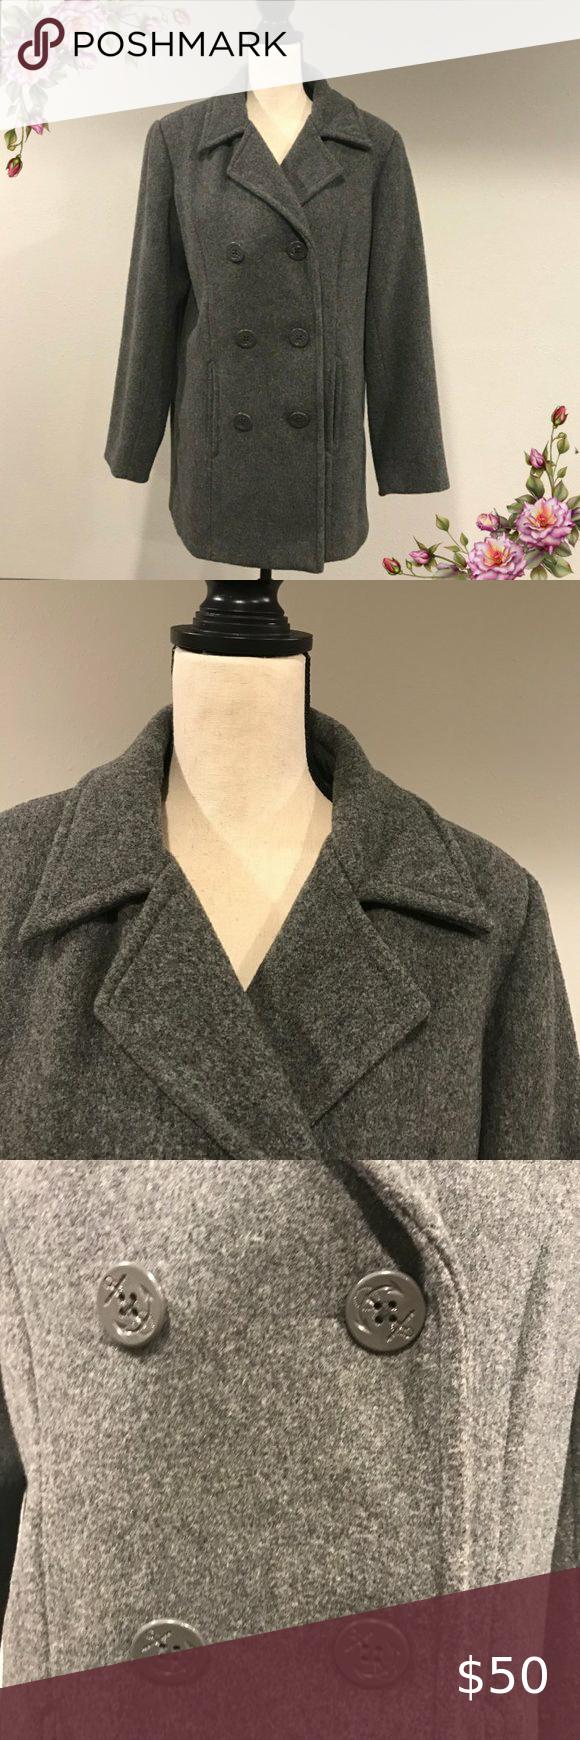 Centigrade Women S 100 Wool Peacoat Wool Peacoat Warm Outfits Pink Collarless Coat [ 1740 x 580 Pixel ]